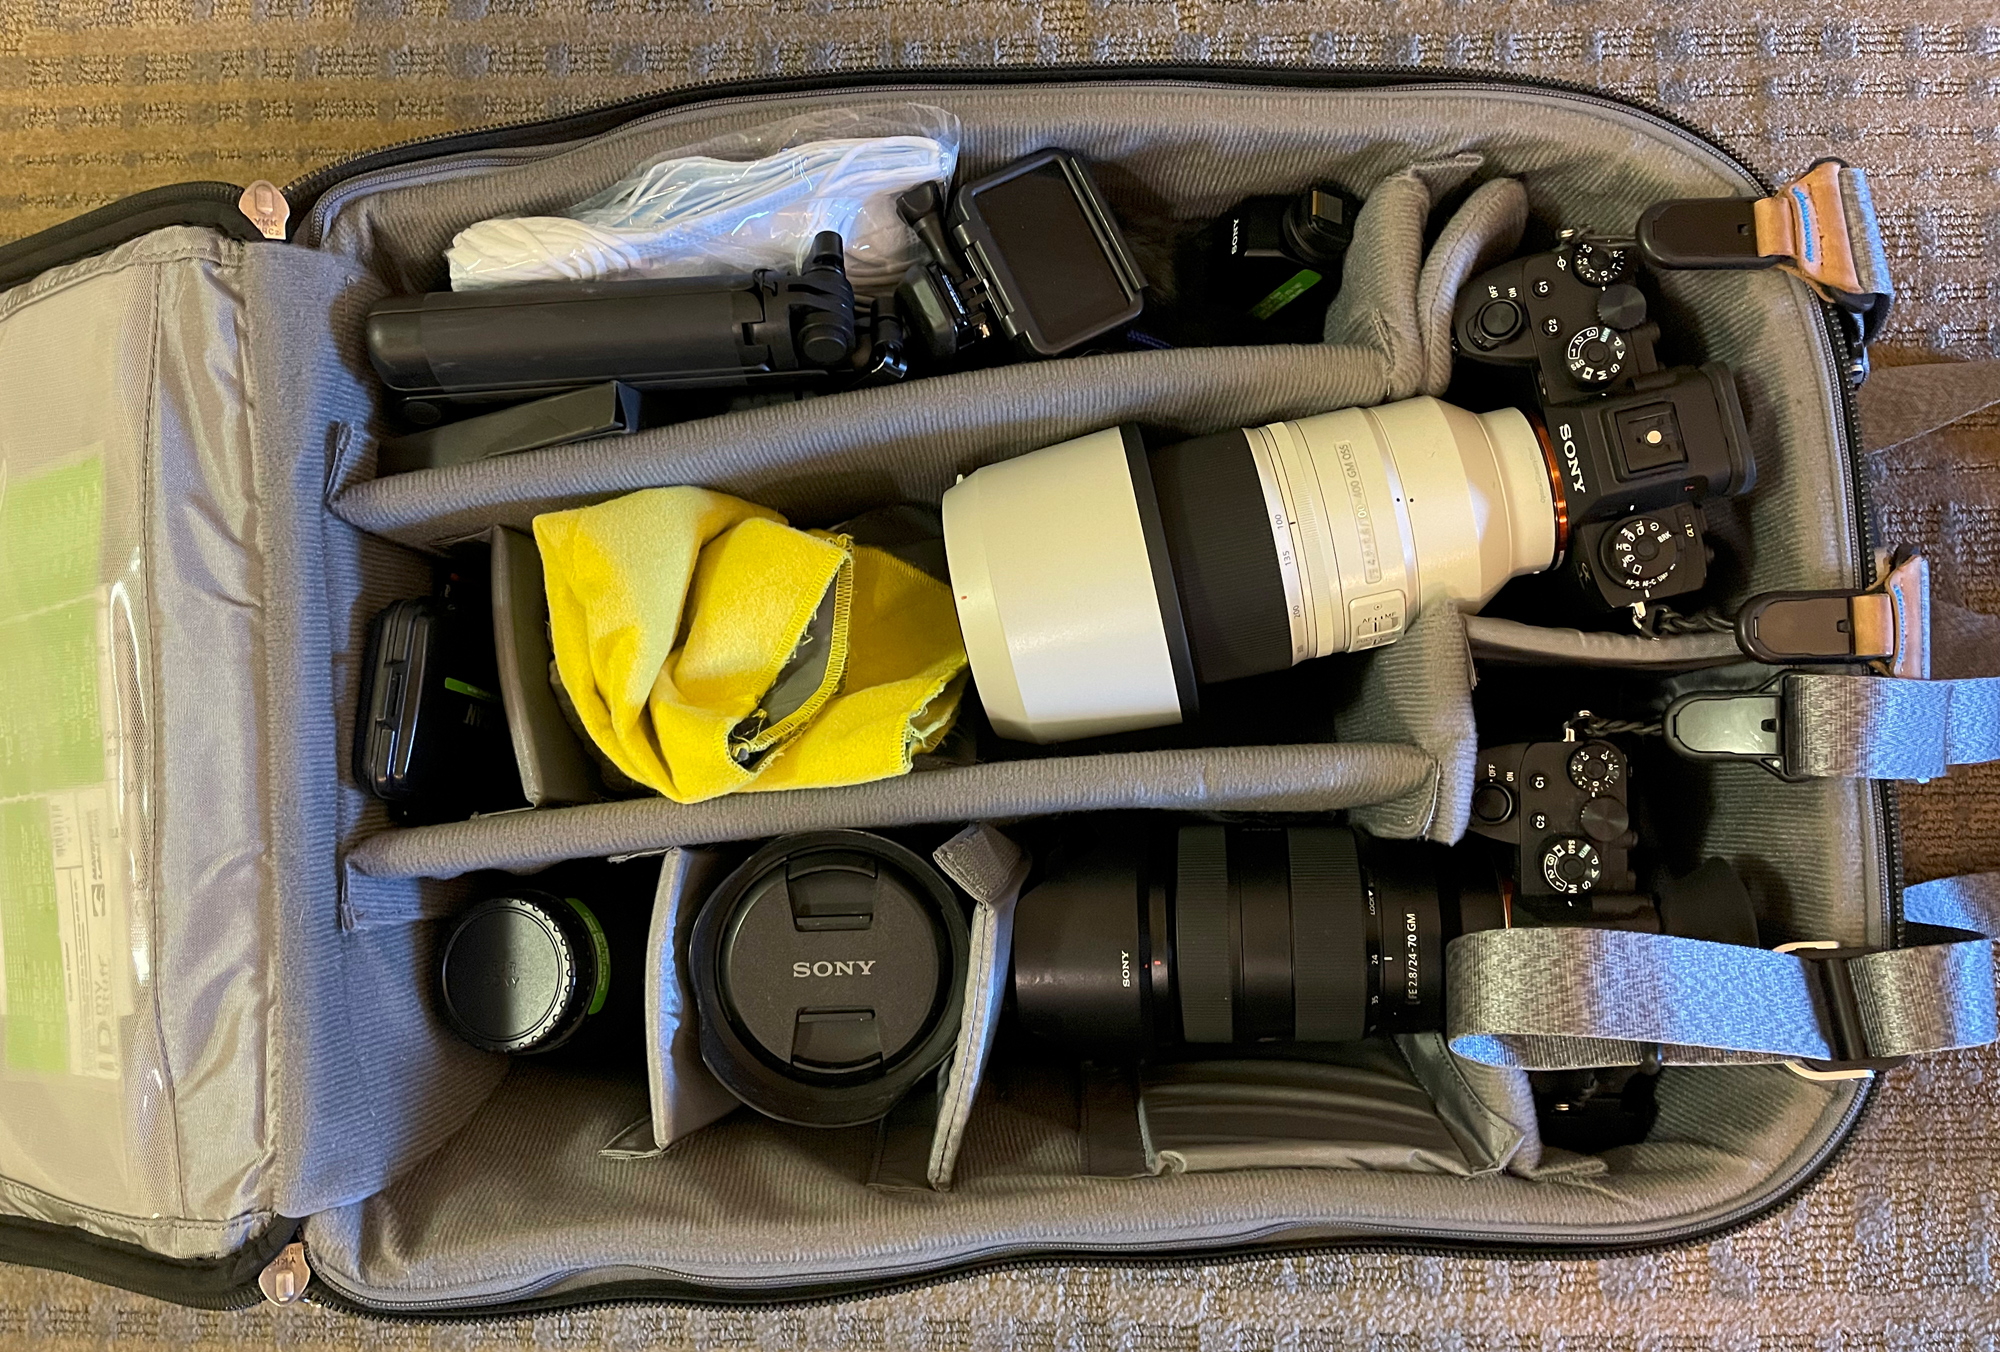 My kit a1, a7riv, 100-400mm, 24-70, 12-24mm, 16-35.